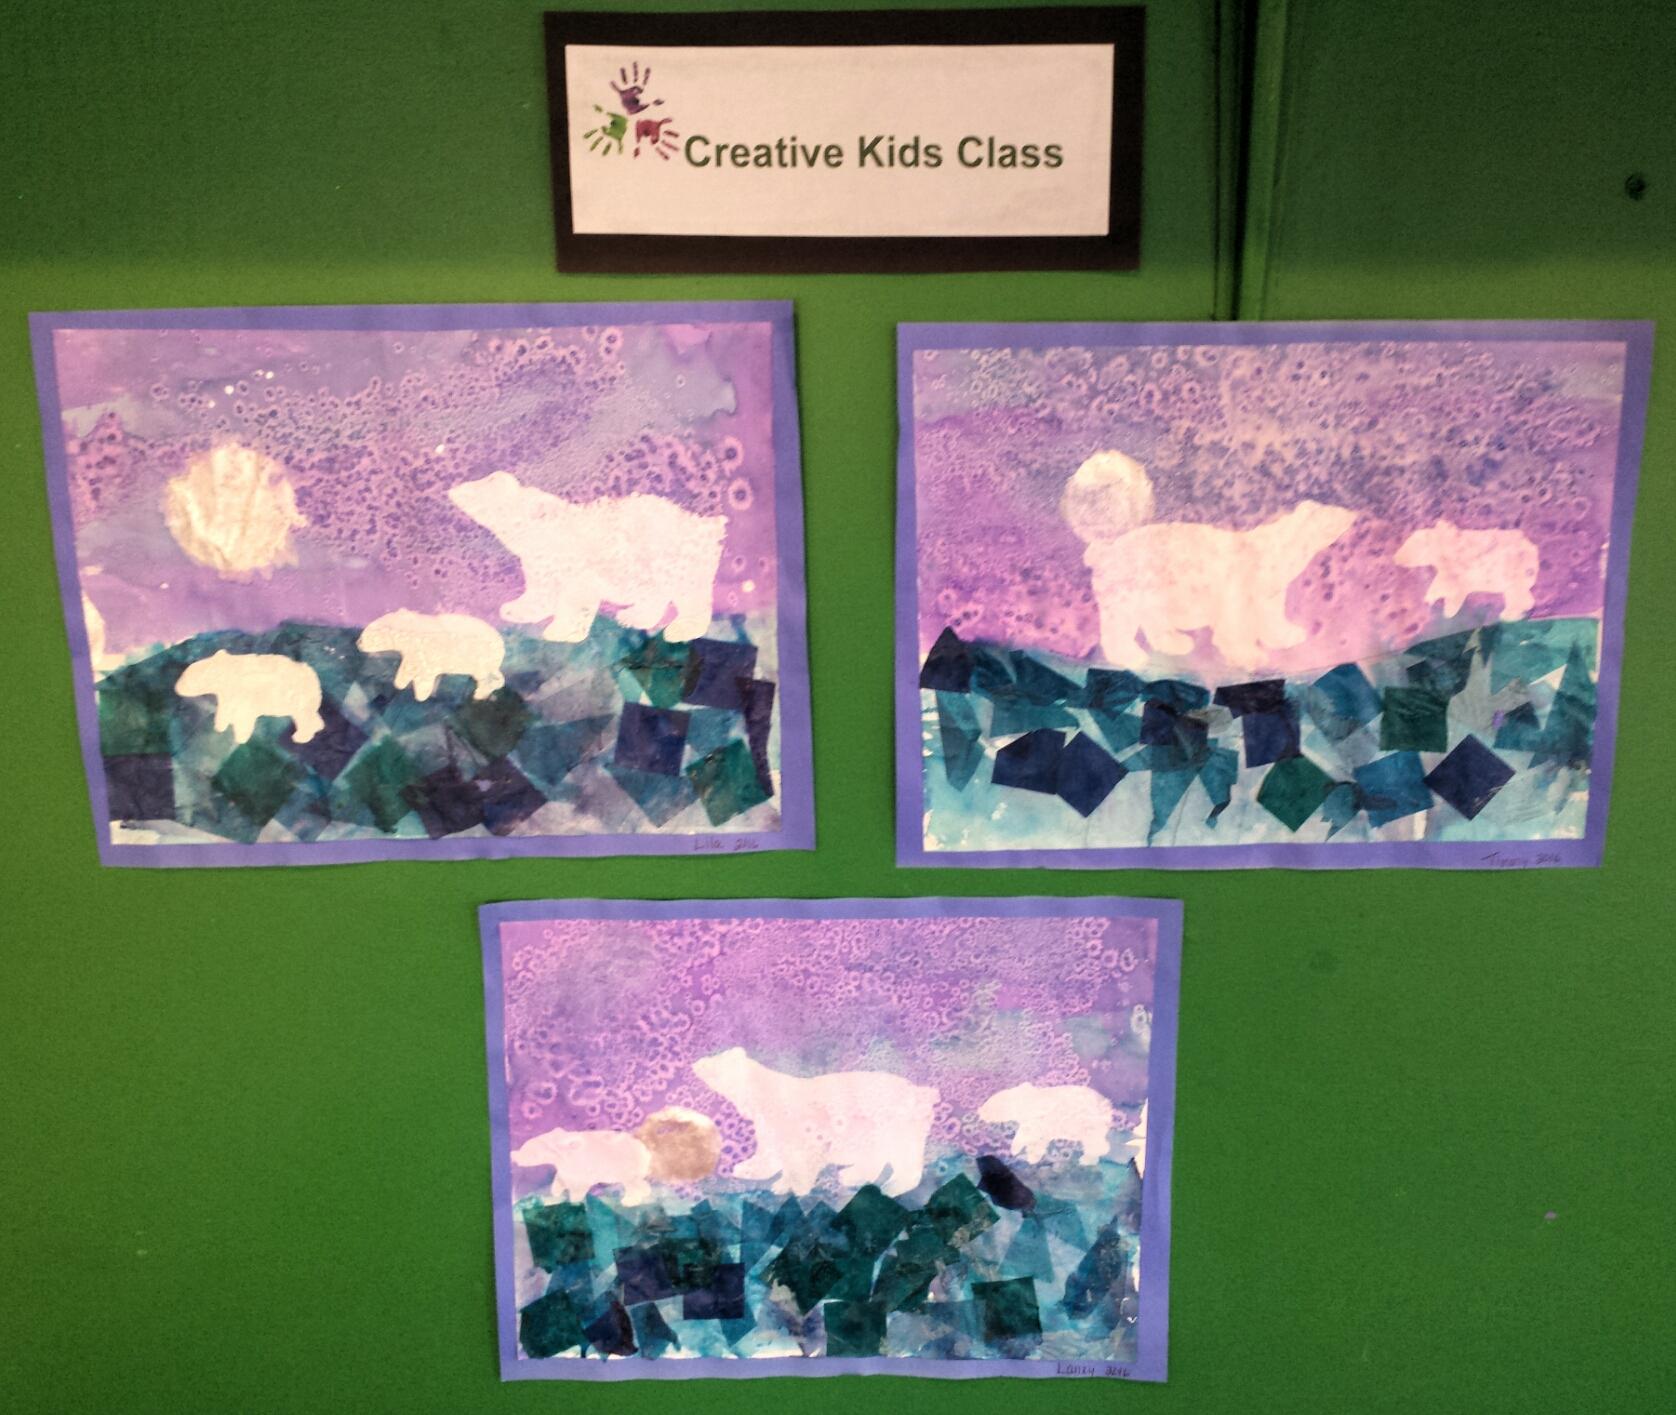 Creative Kids - Centreville Preschool - Centreville, VA 20120